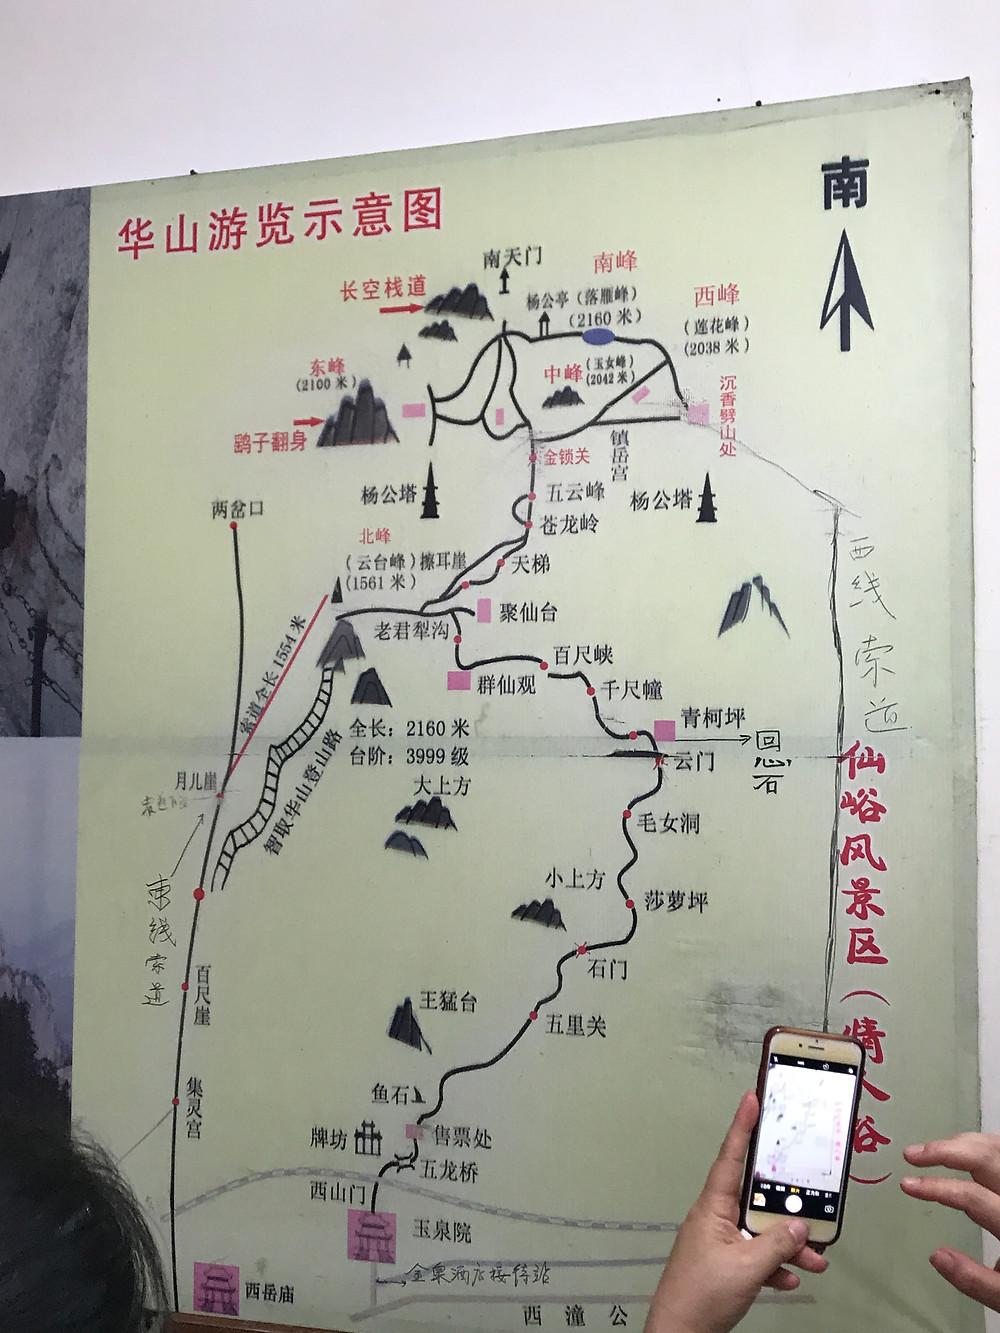 Hua Shan map